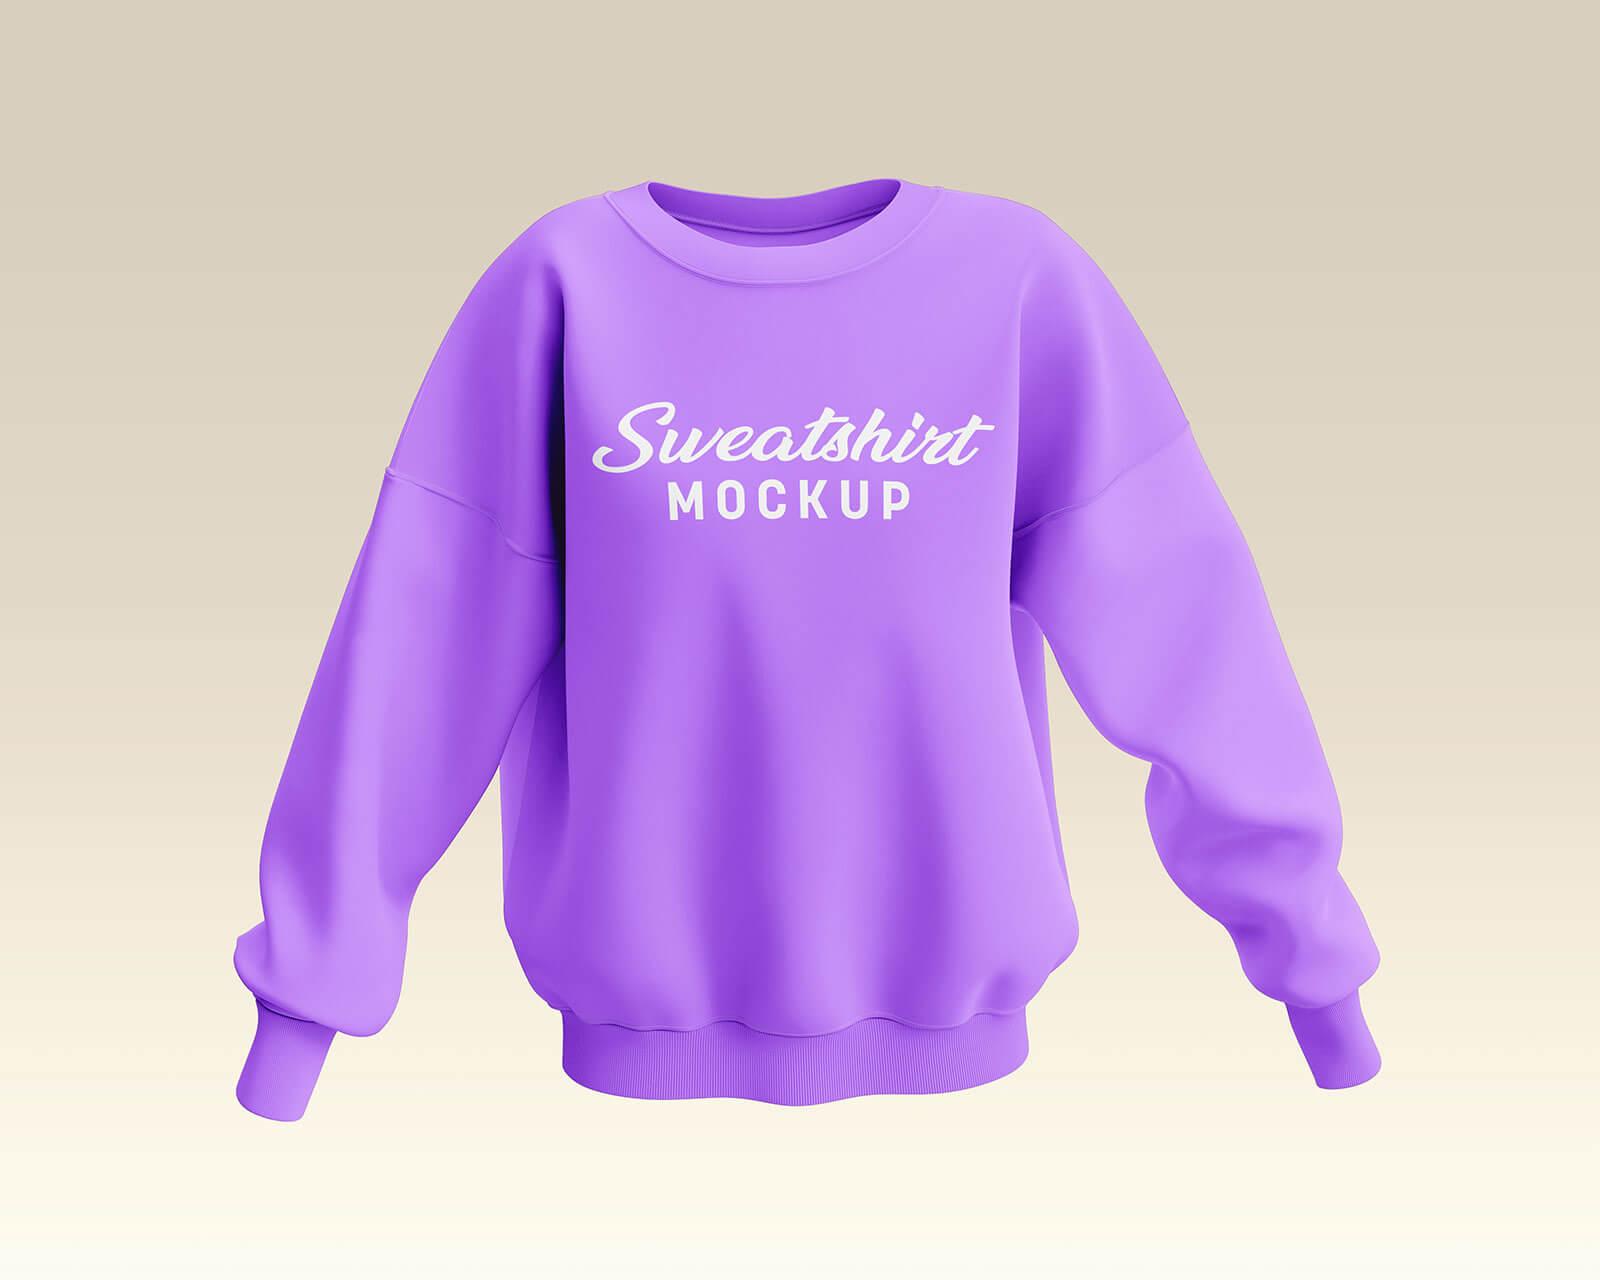 Free Women's Sweatshirt Mockup PSD Set